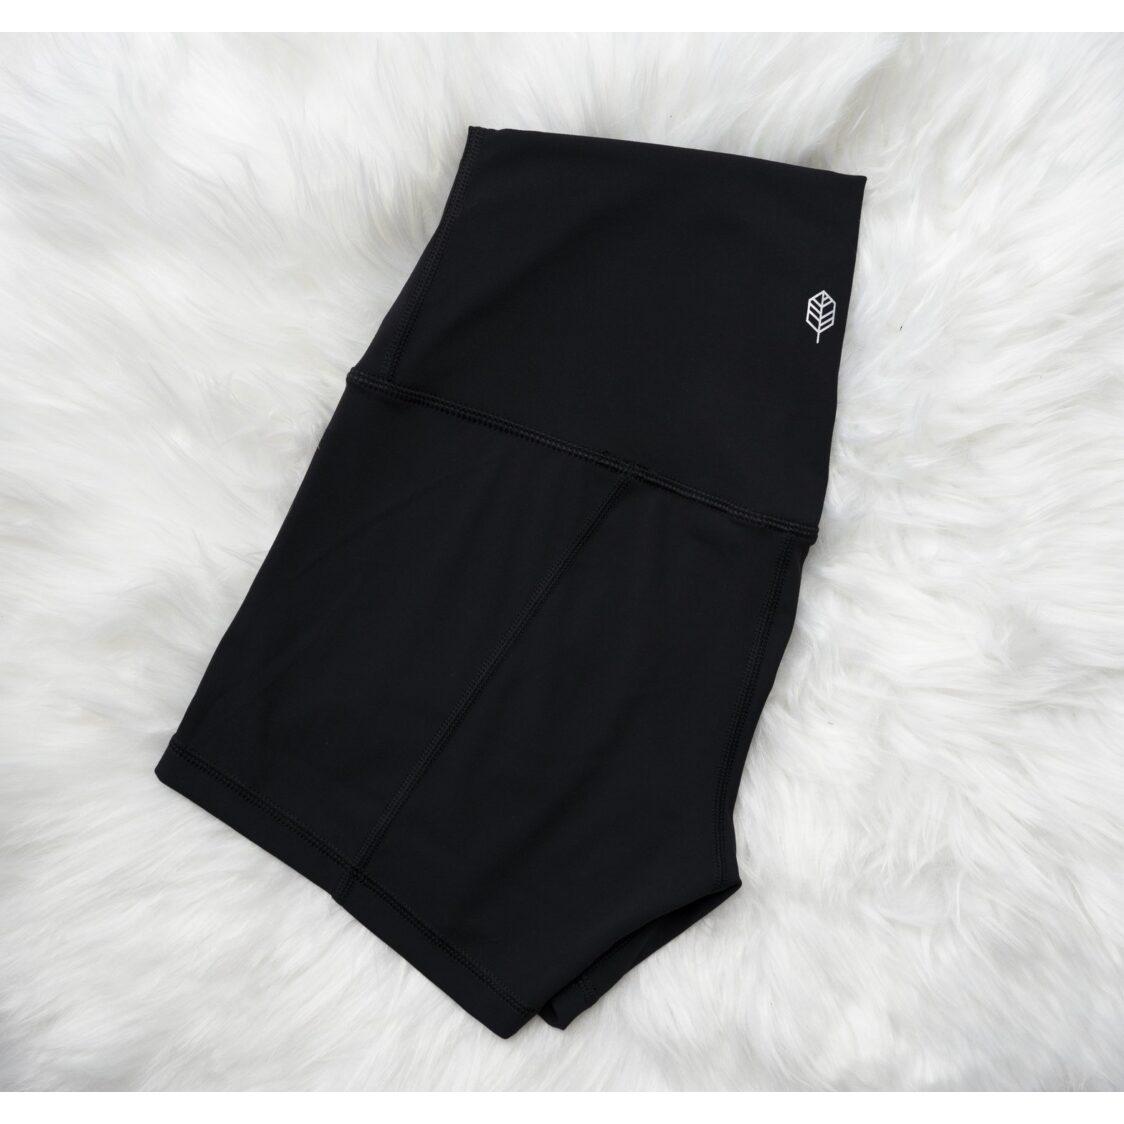 YOF Athletica I-Lift 4In Short Black